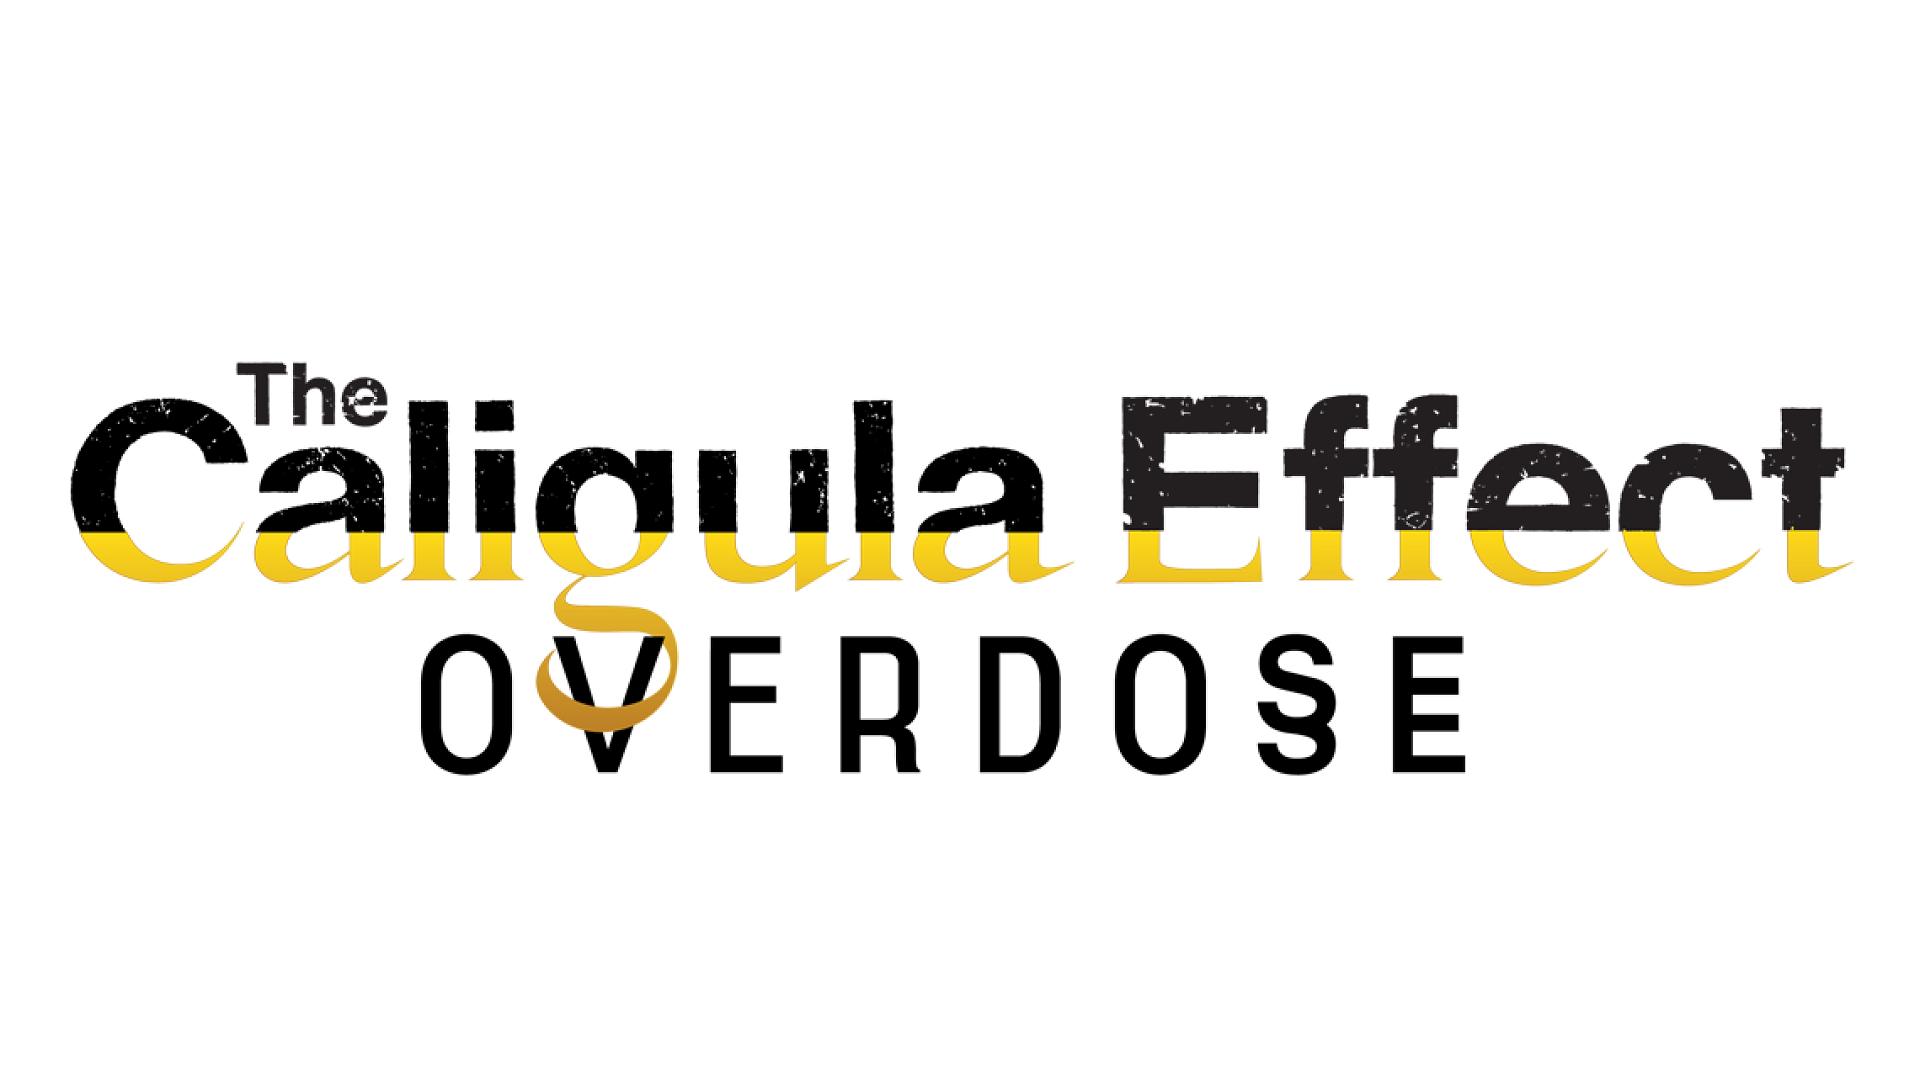 The Caligula Effect Overdose Wallpapers